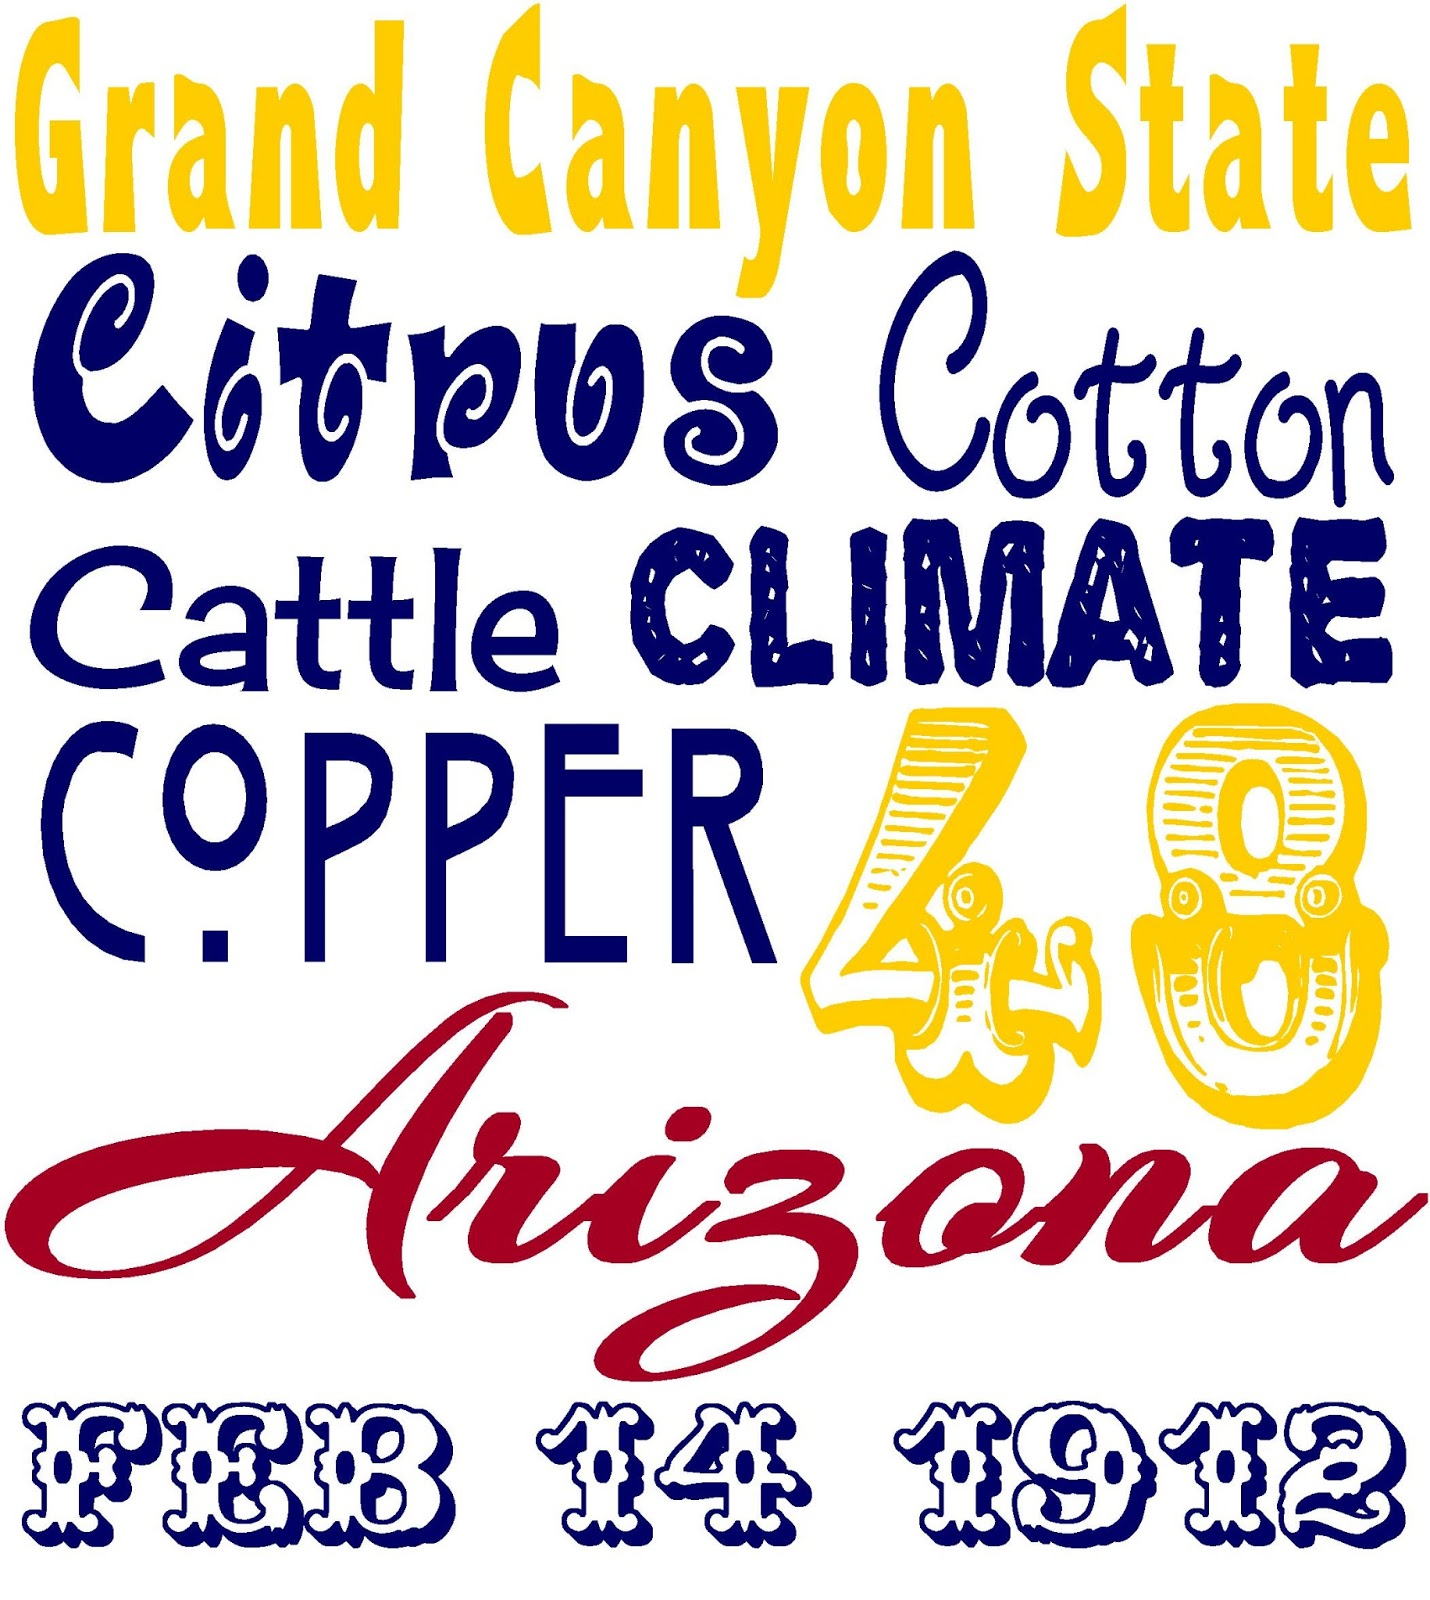 The creative cubby happy arizona statehood day